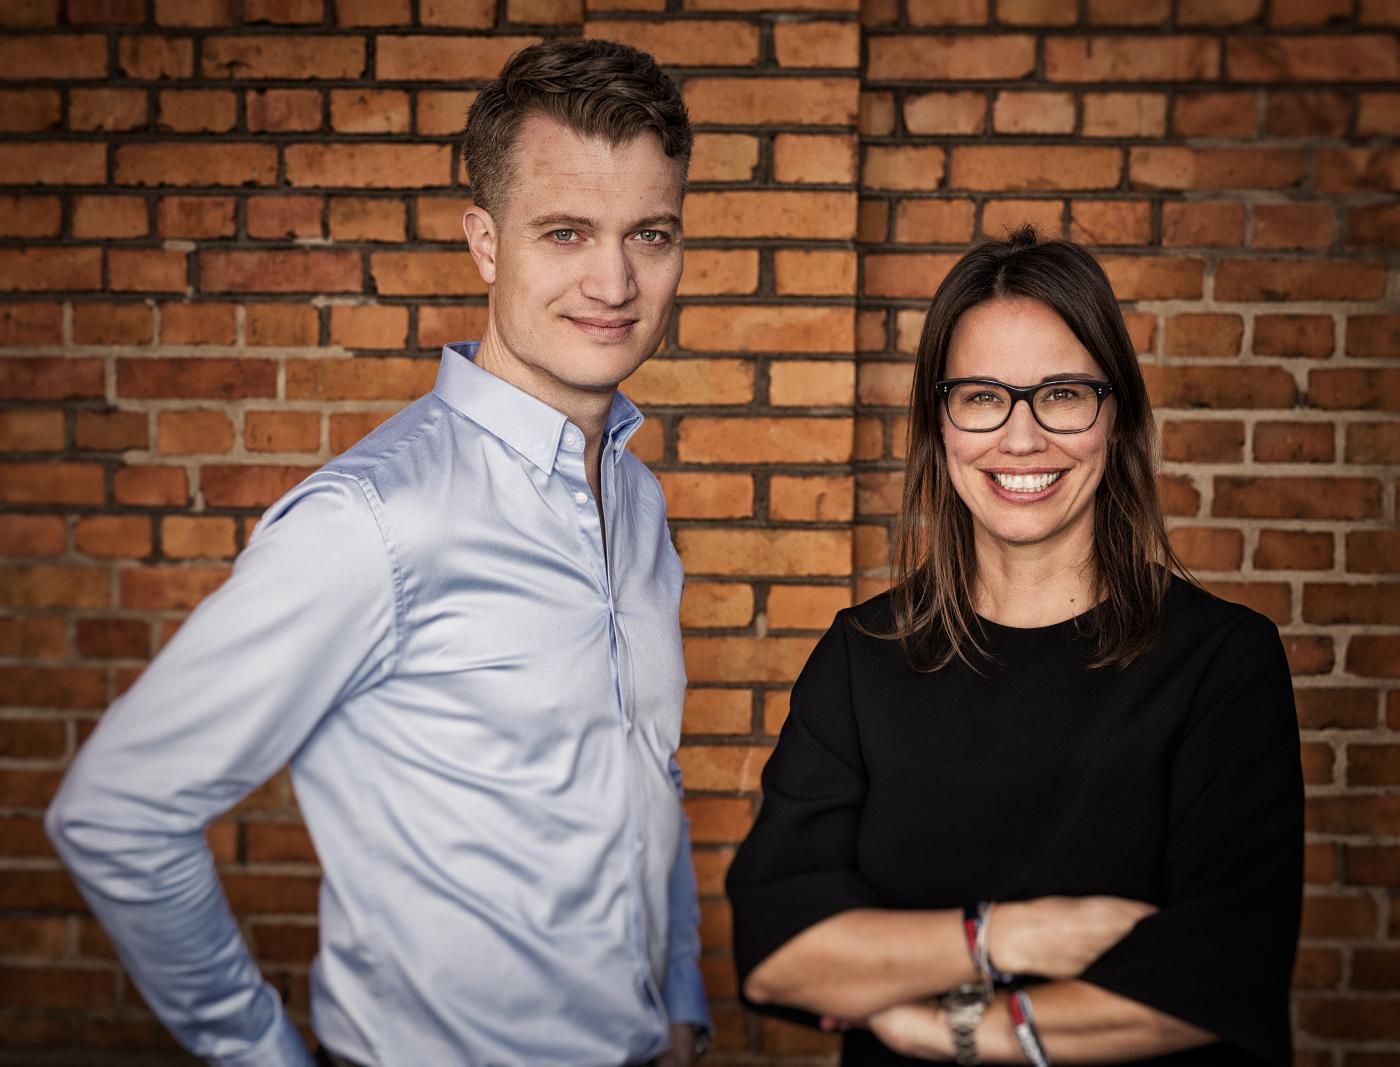 Alexander Bricca and Ebba Ljungerud